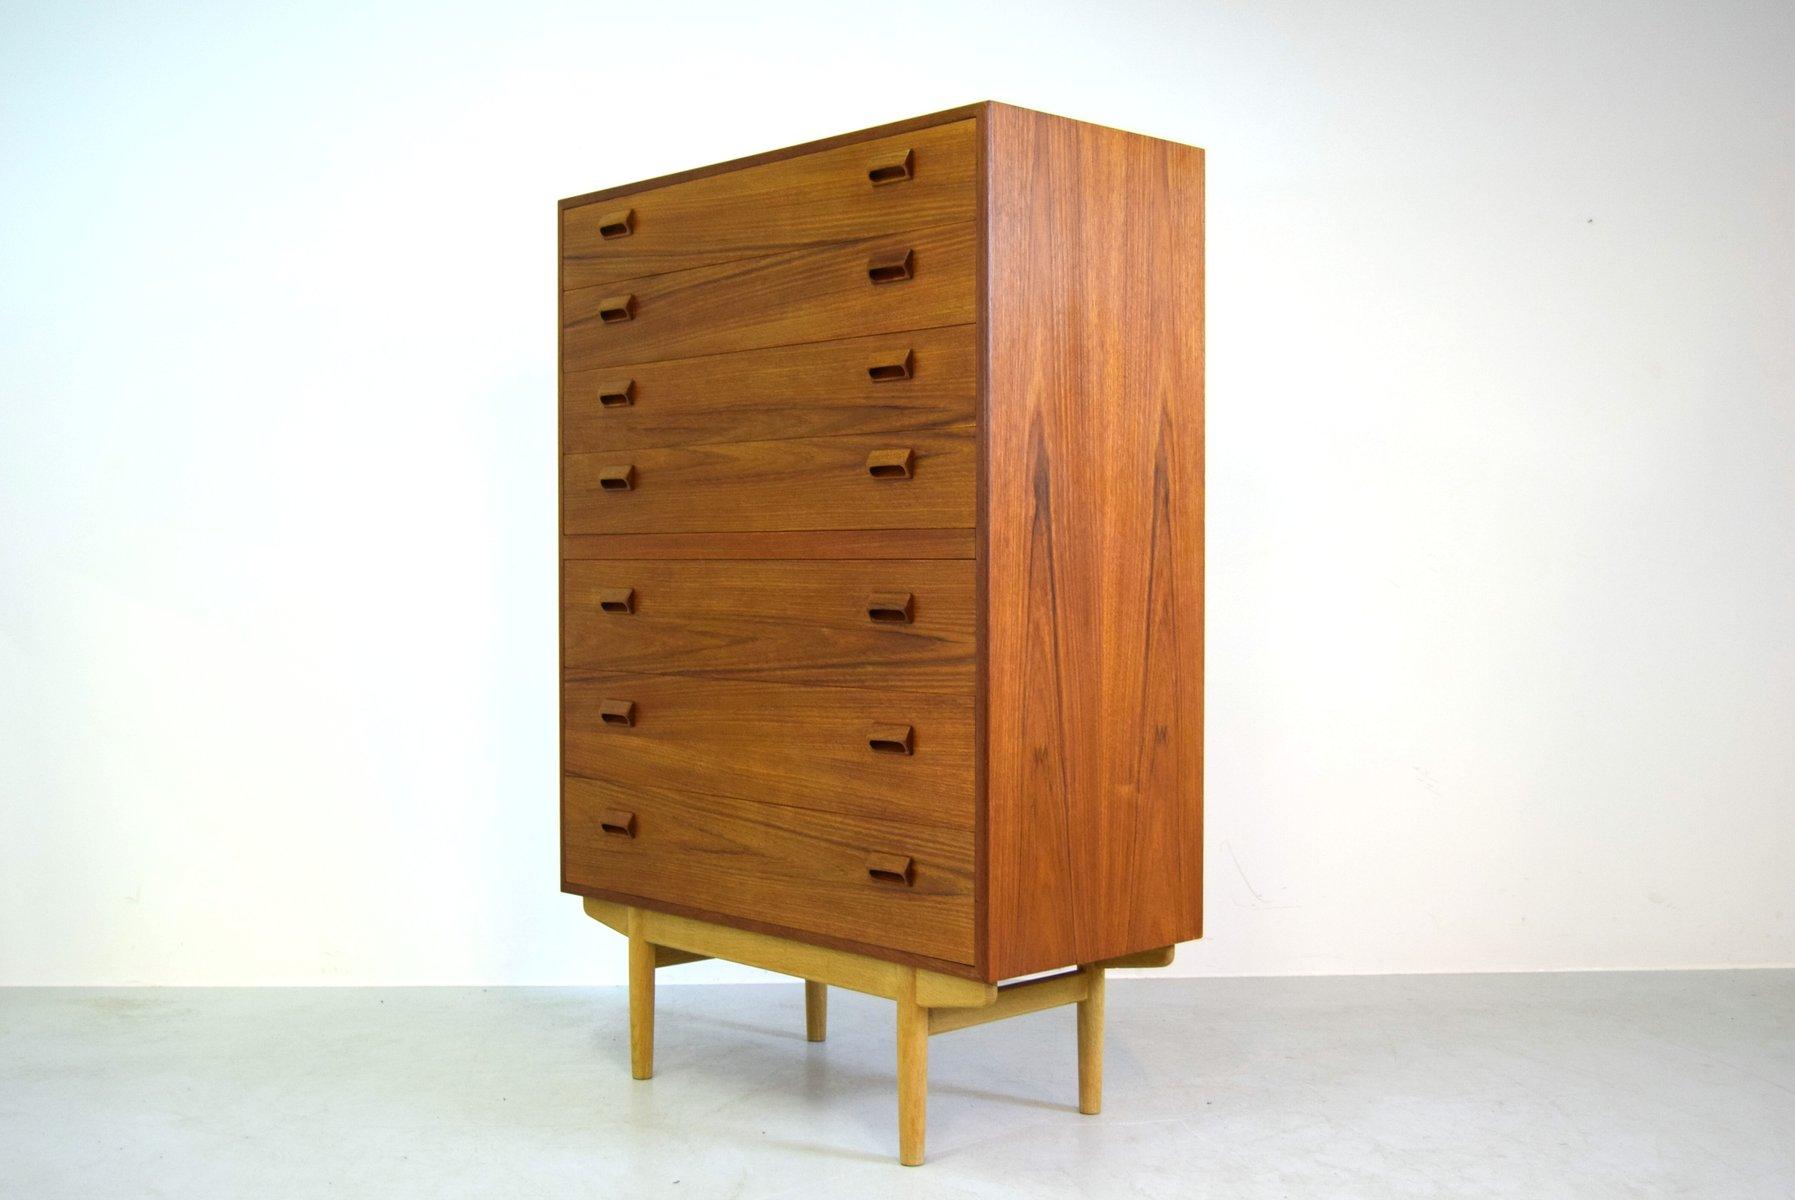 hohe teak kommode von b rge mogensen f r s borg m bler. Black Bedroom Furniture Sets. Home Design Ideas